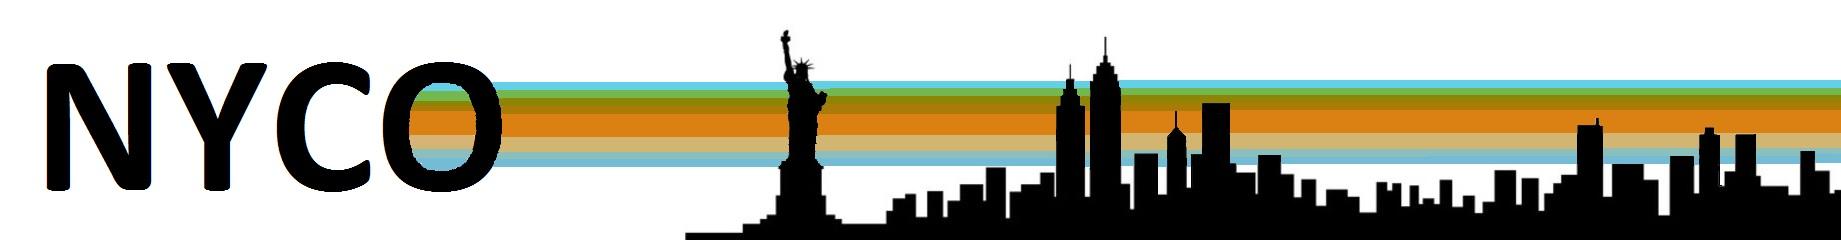 NYCO Environmental & Dewatering Corp. Logo